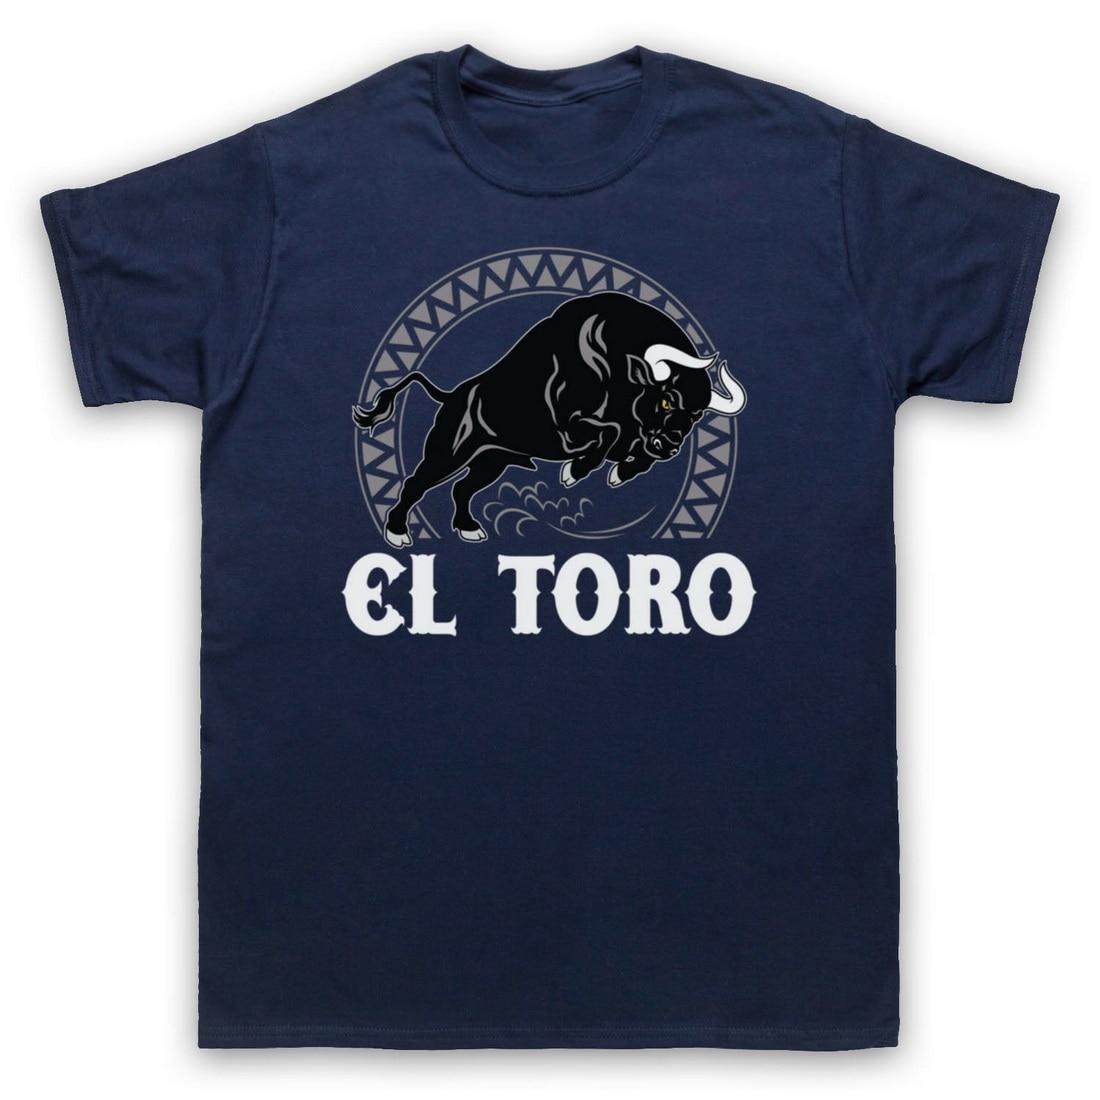 EL TORO SPANISH BULL COOL RETRO SPAIN CULTURE ANIMAL MENS WOMENS Men Tops Tee T Shirt Graphic T-Shirt